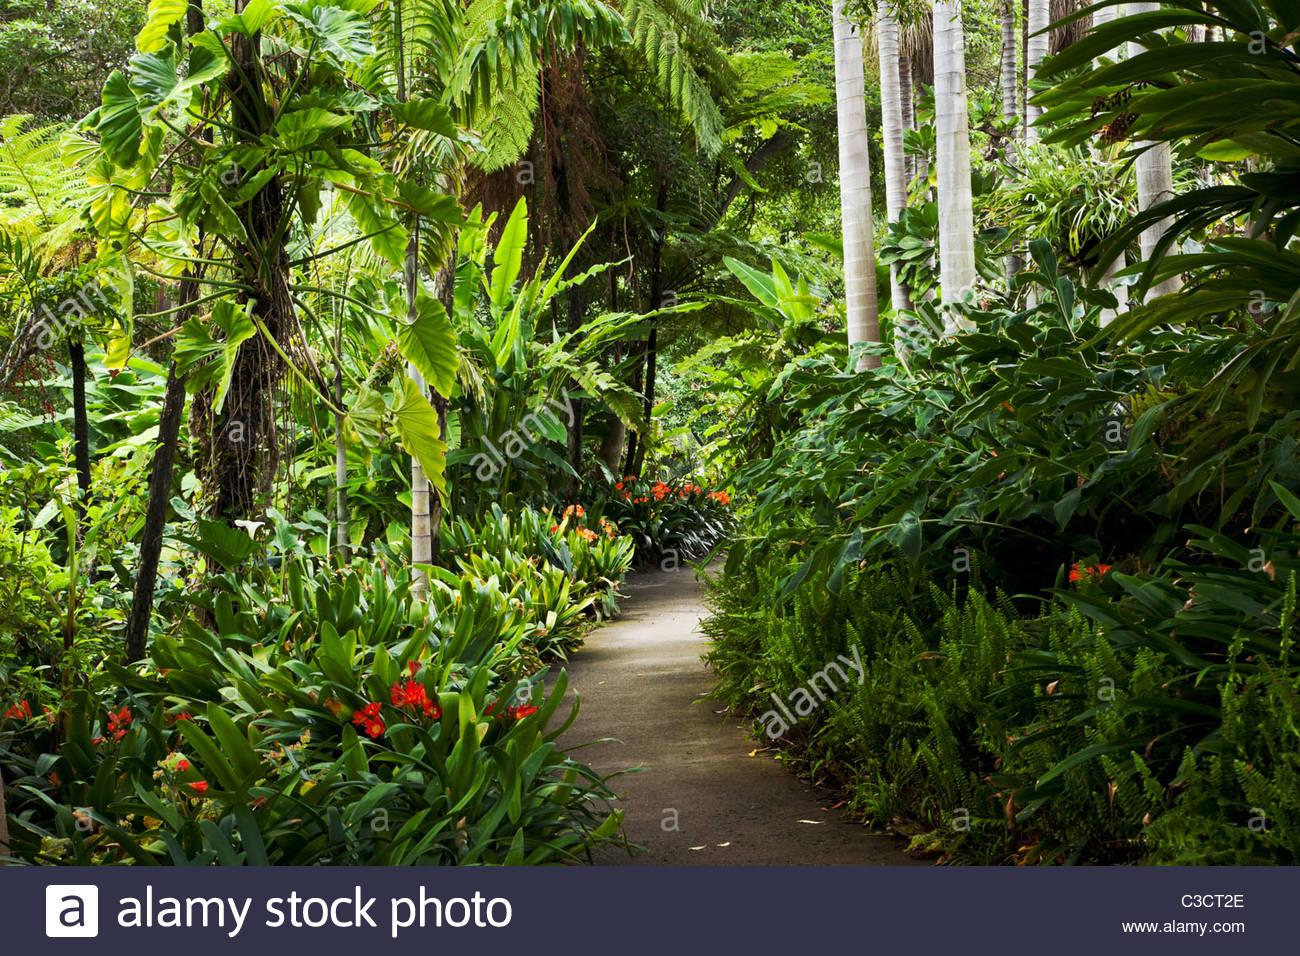 Jungle Garden at The Huntington, San Marino, California - Stock Image